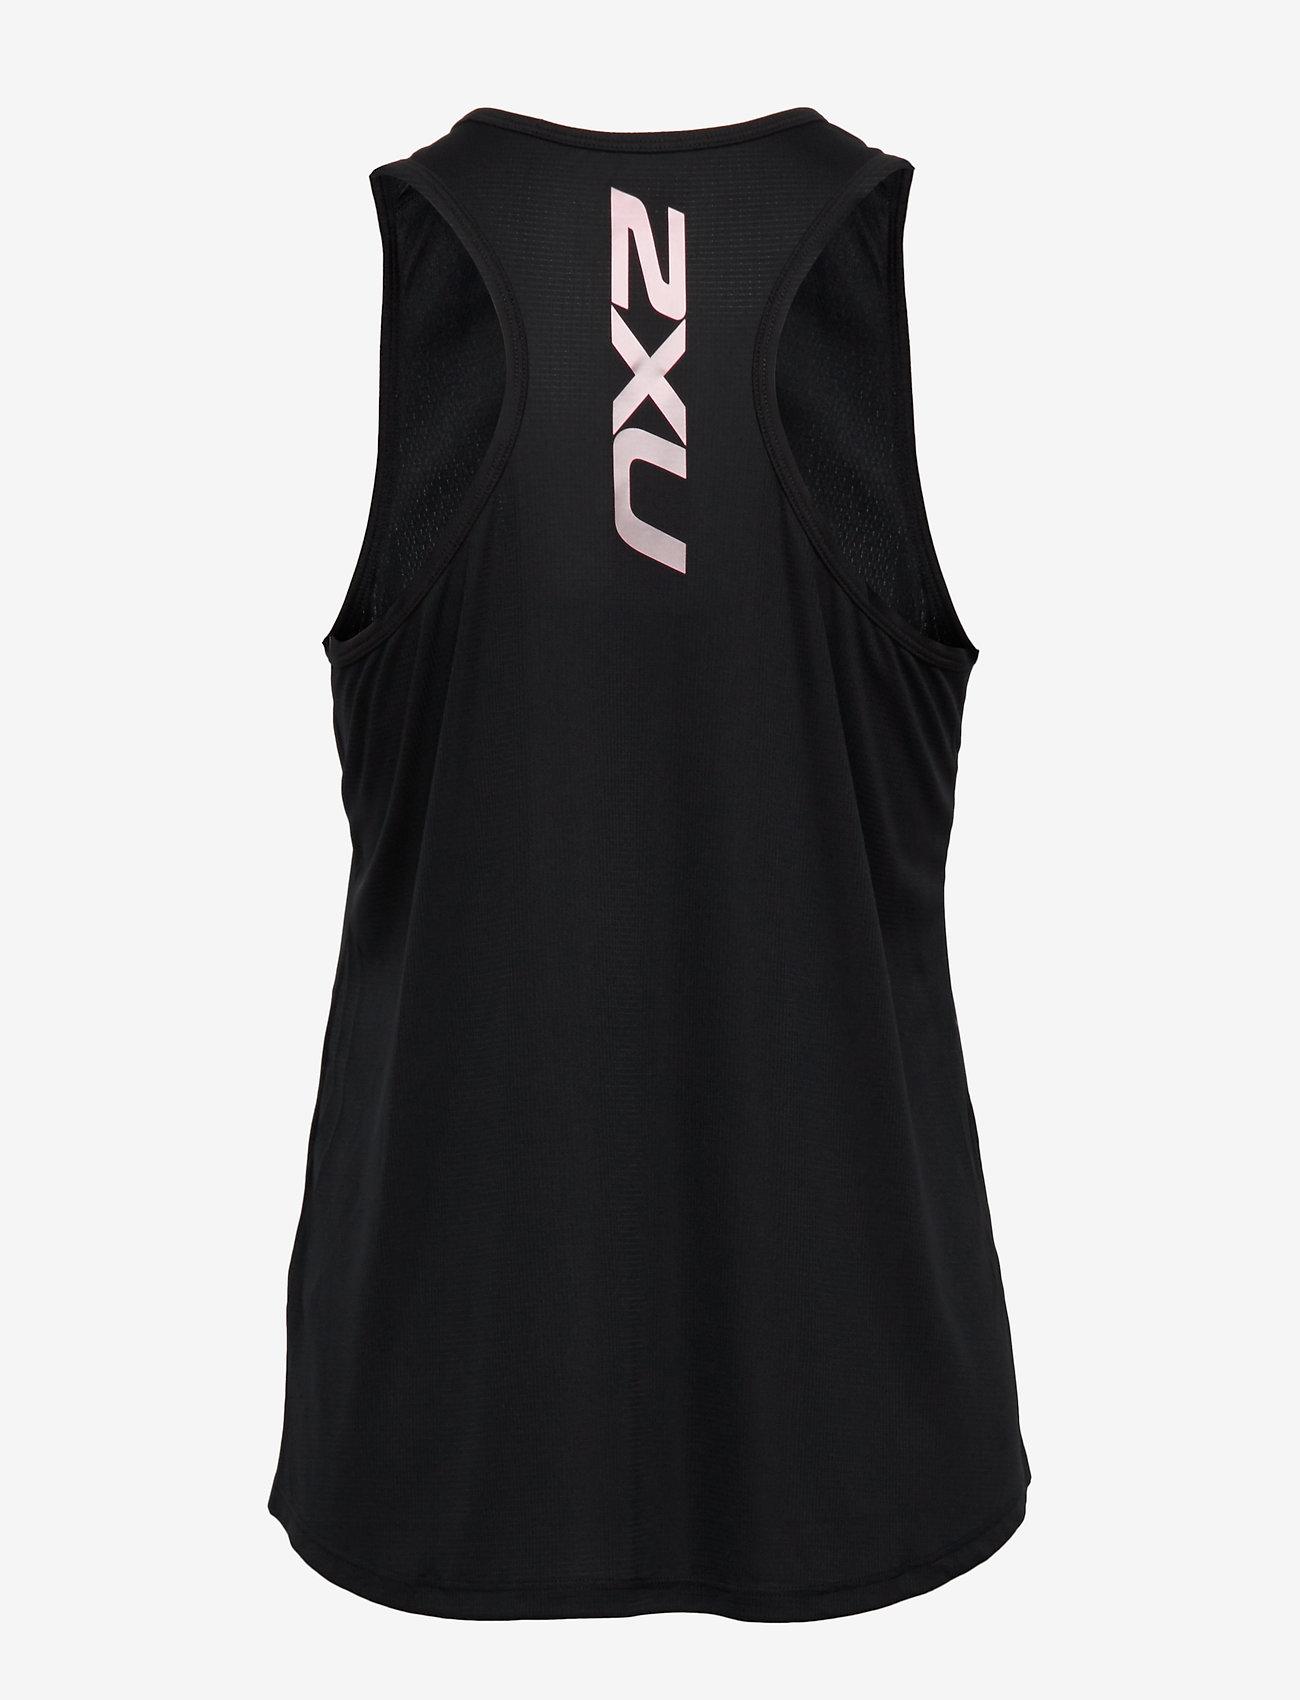 Xvent G2 Racer Singlet-w (Black/multi Colour Reflective) - 2XU qk0UTB